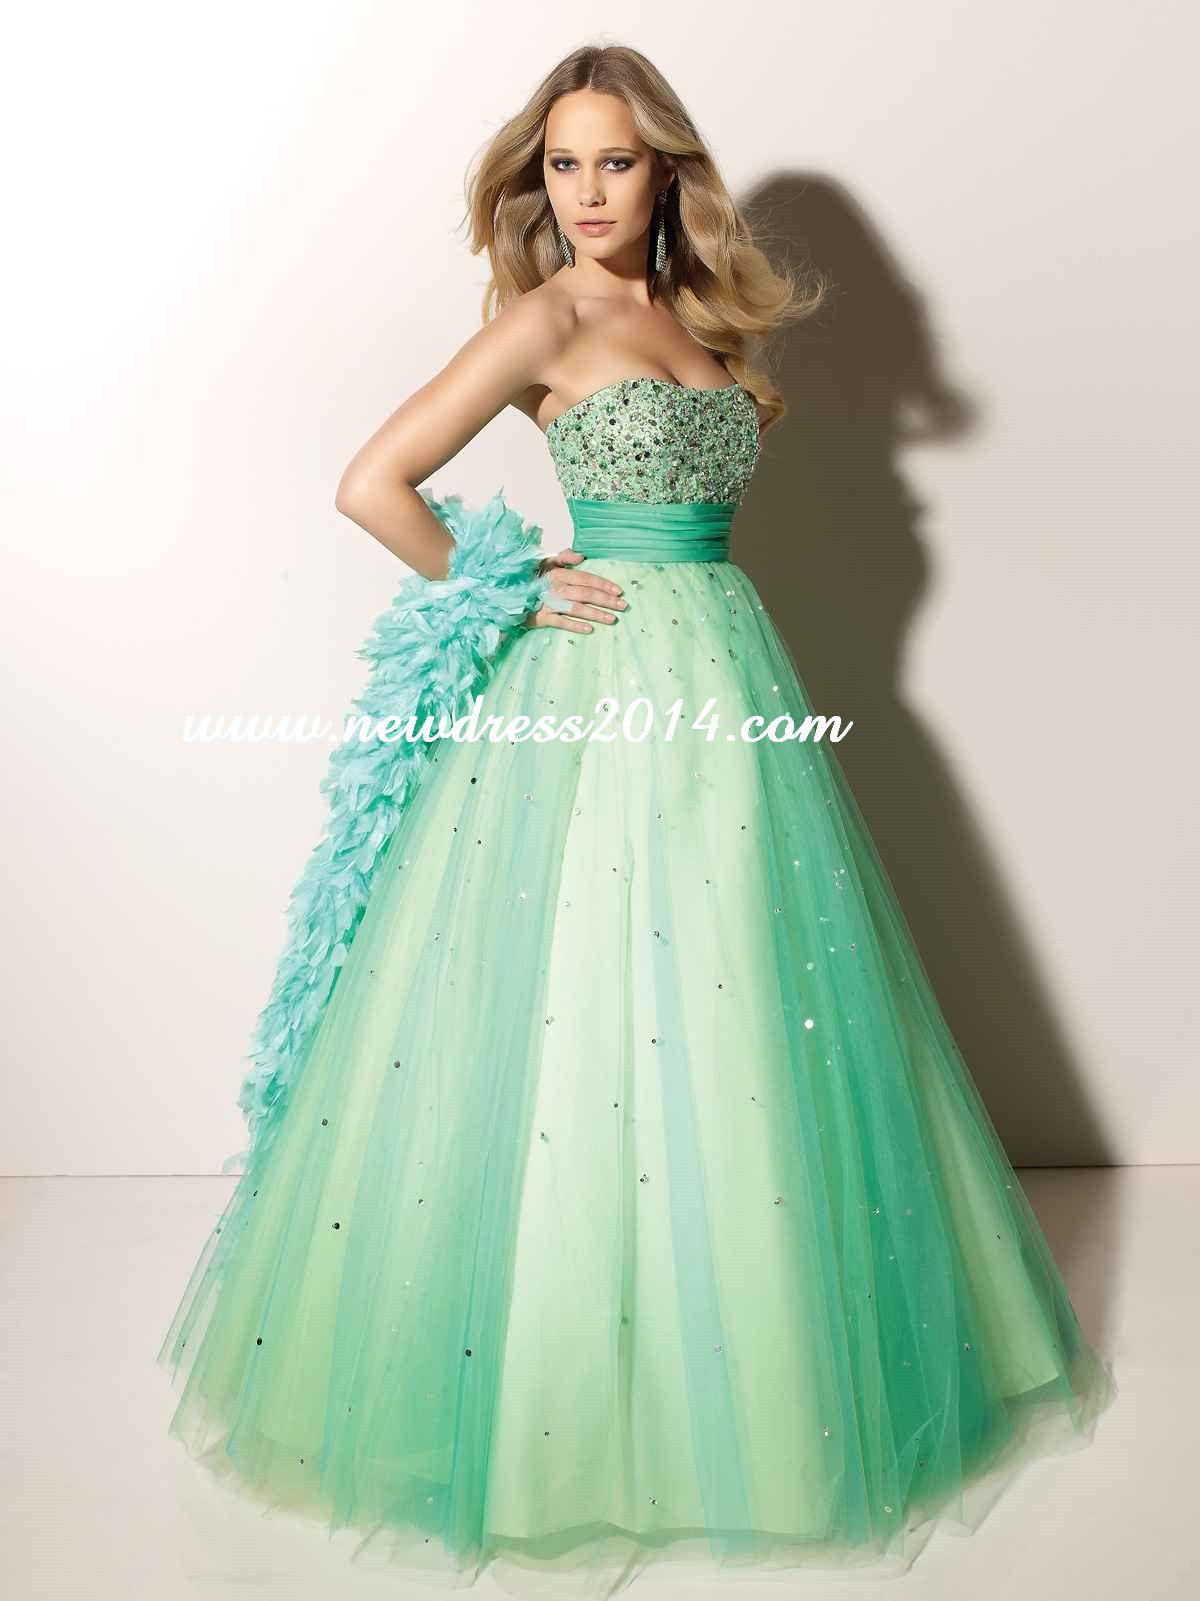 Prom dress prom dress dresses pinterest dress prom prom and